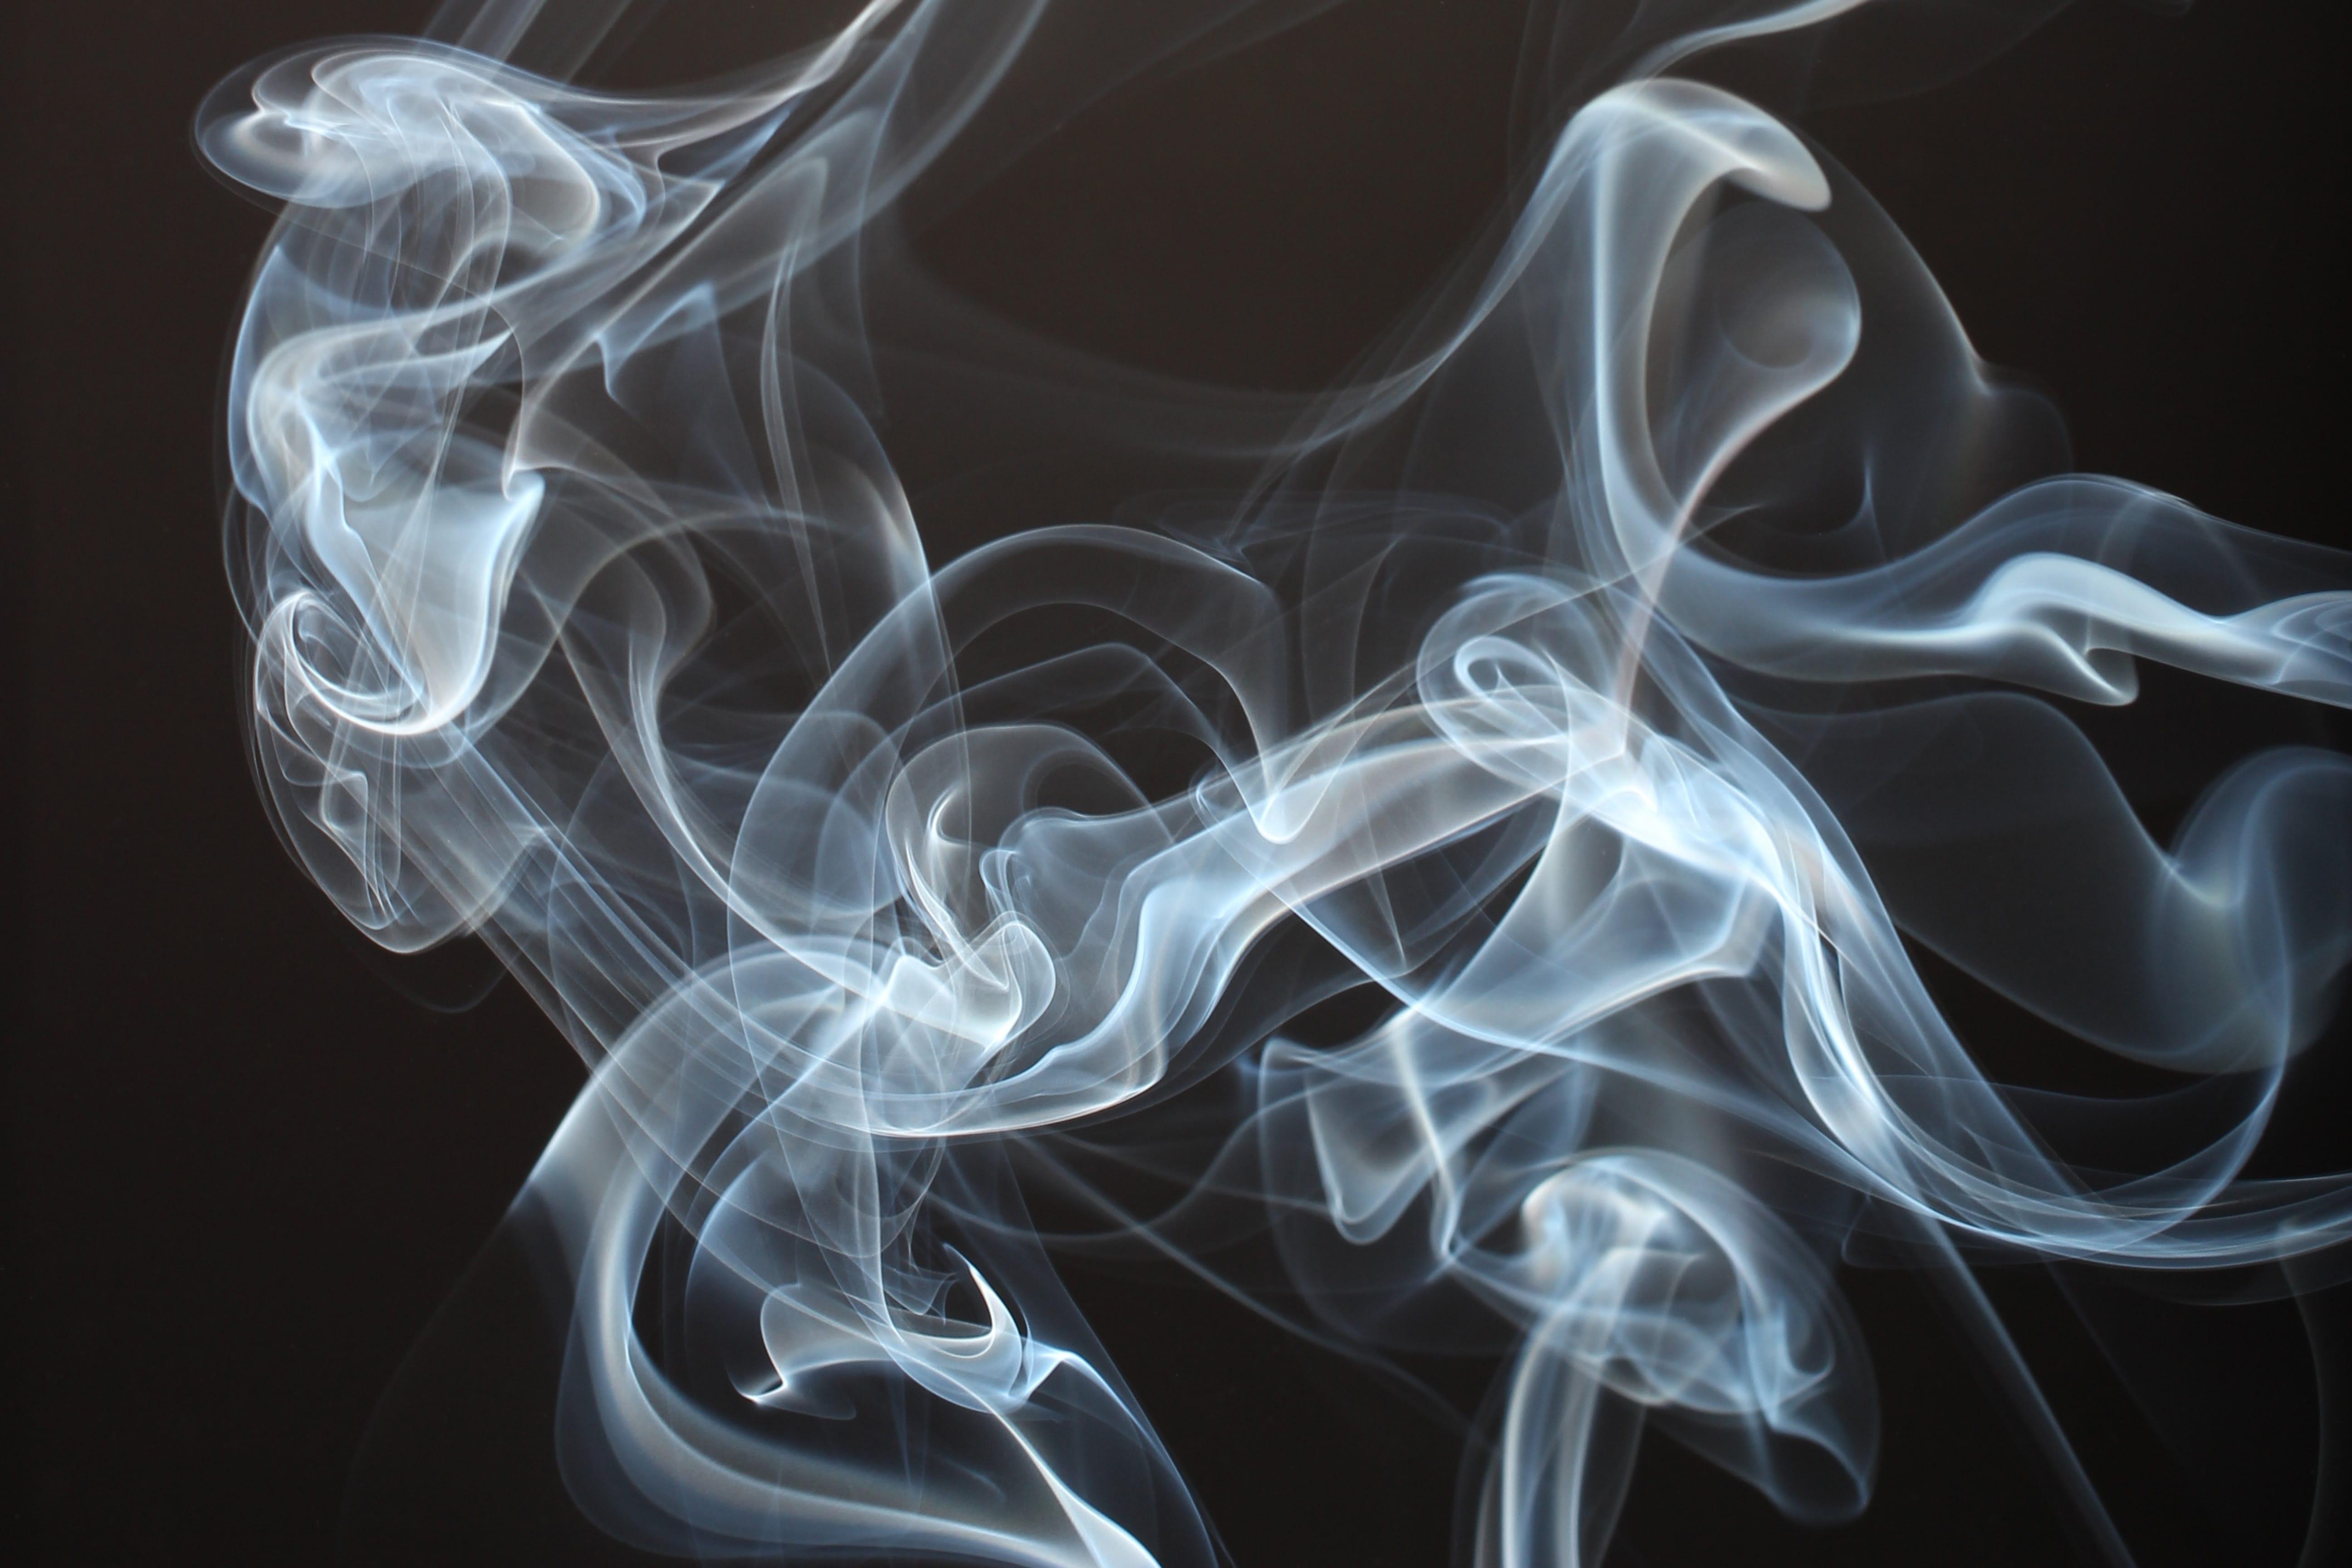 Smoke against a black background; image by Thomas Stephan, via Unsplash.com.